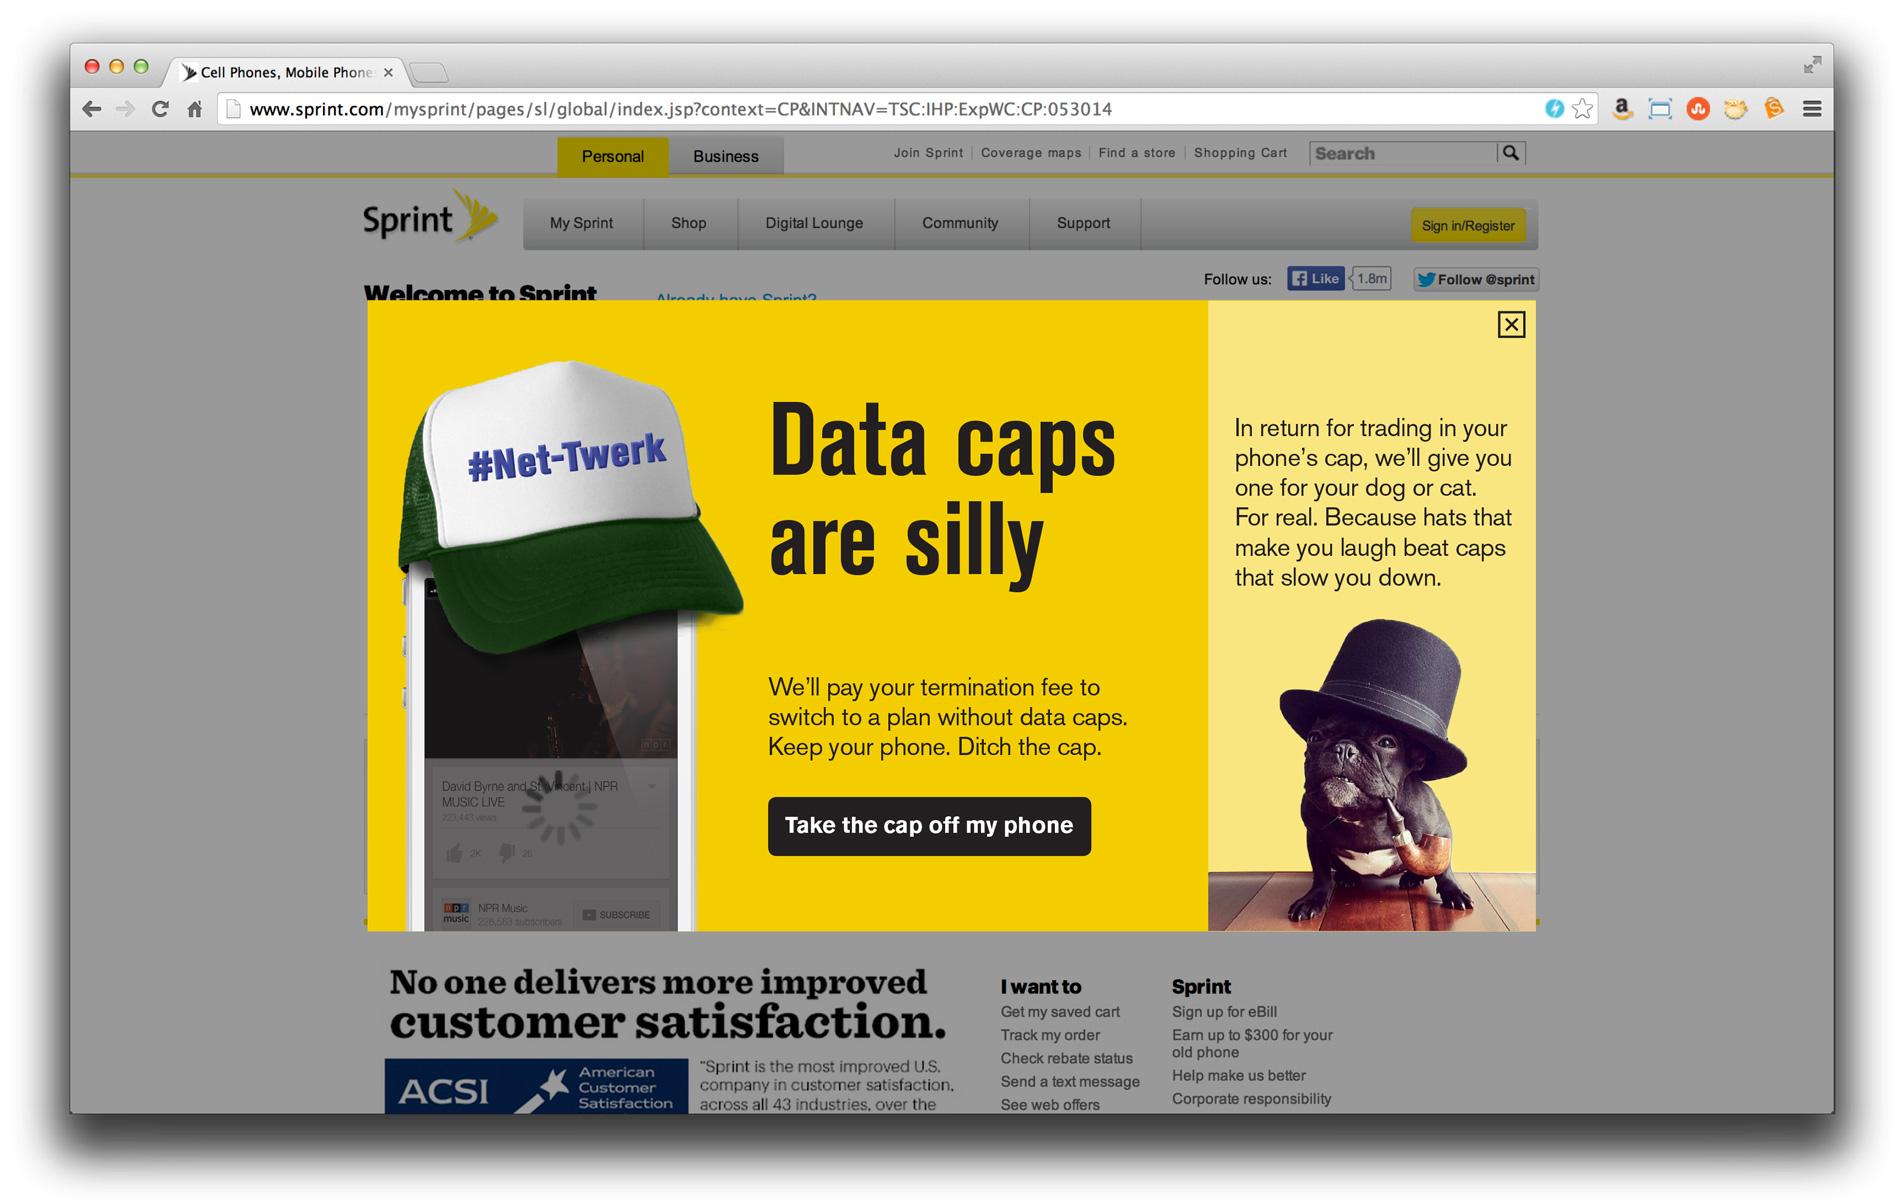 DataCaps_SplashPage_01.jpg